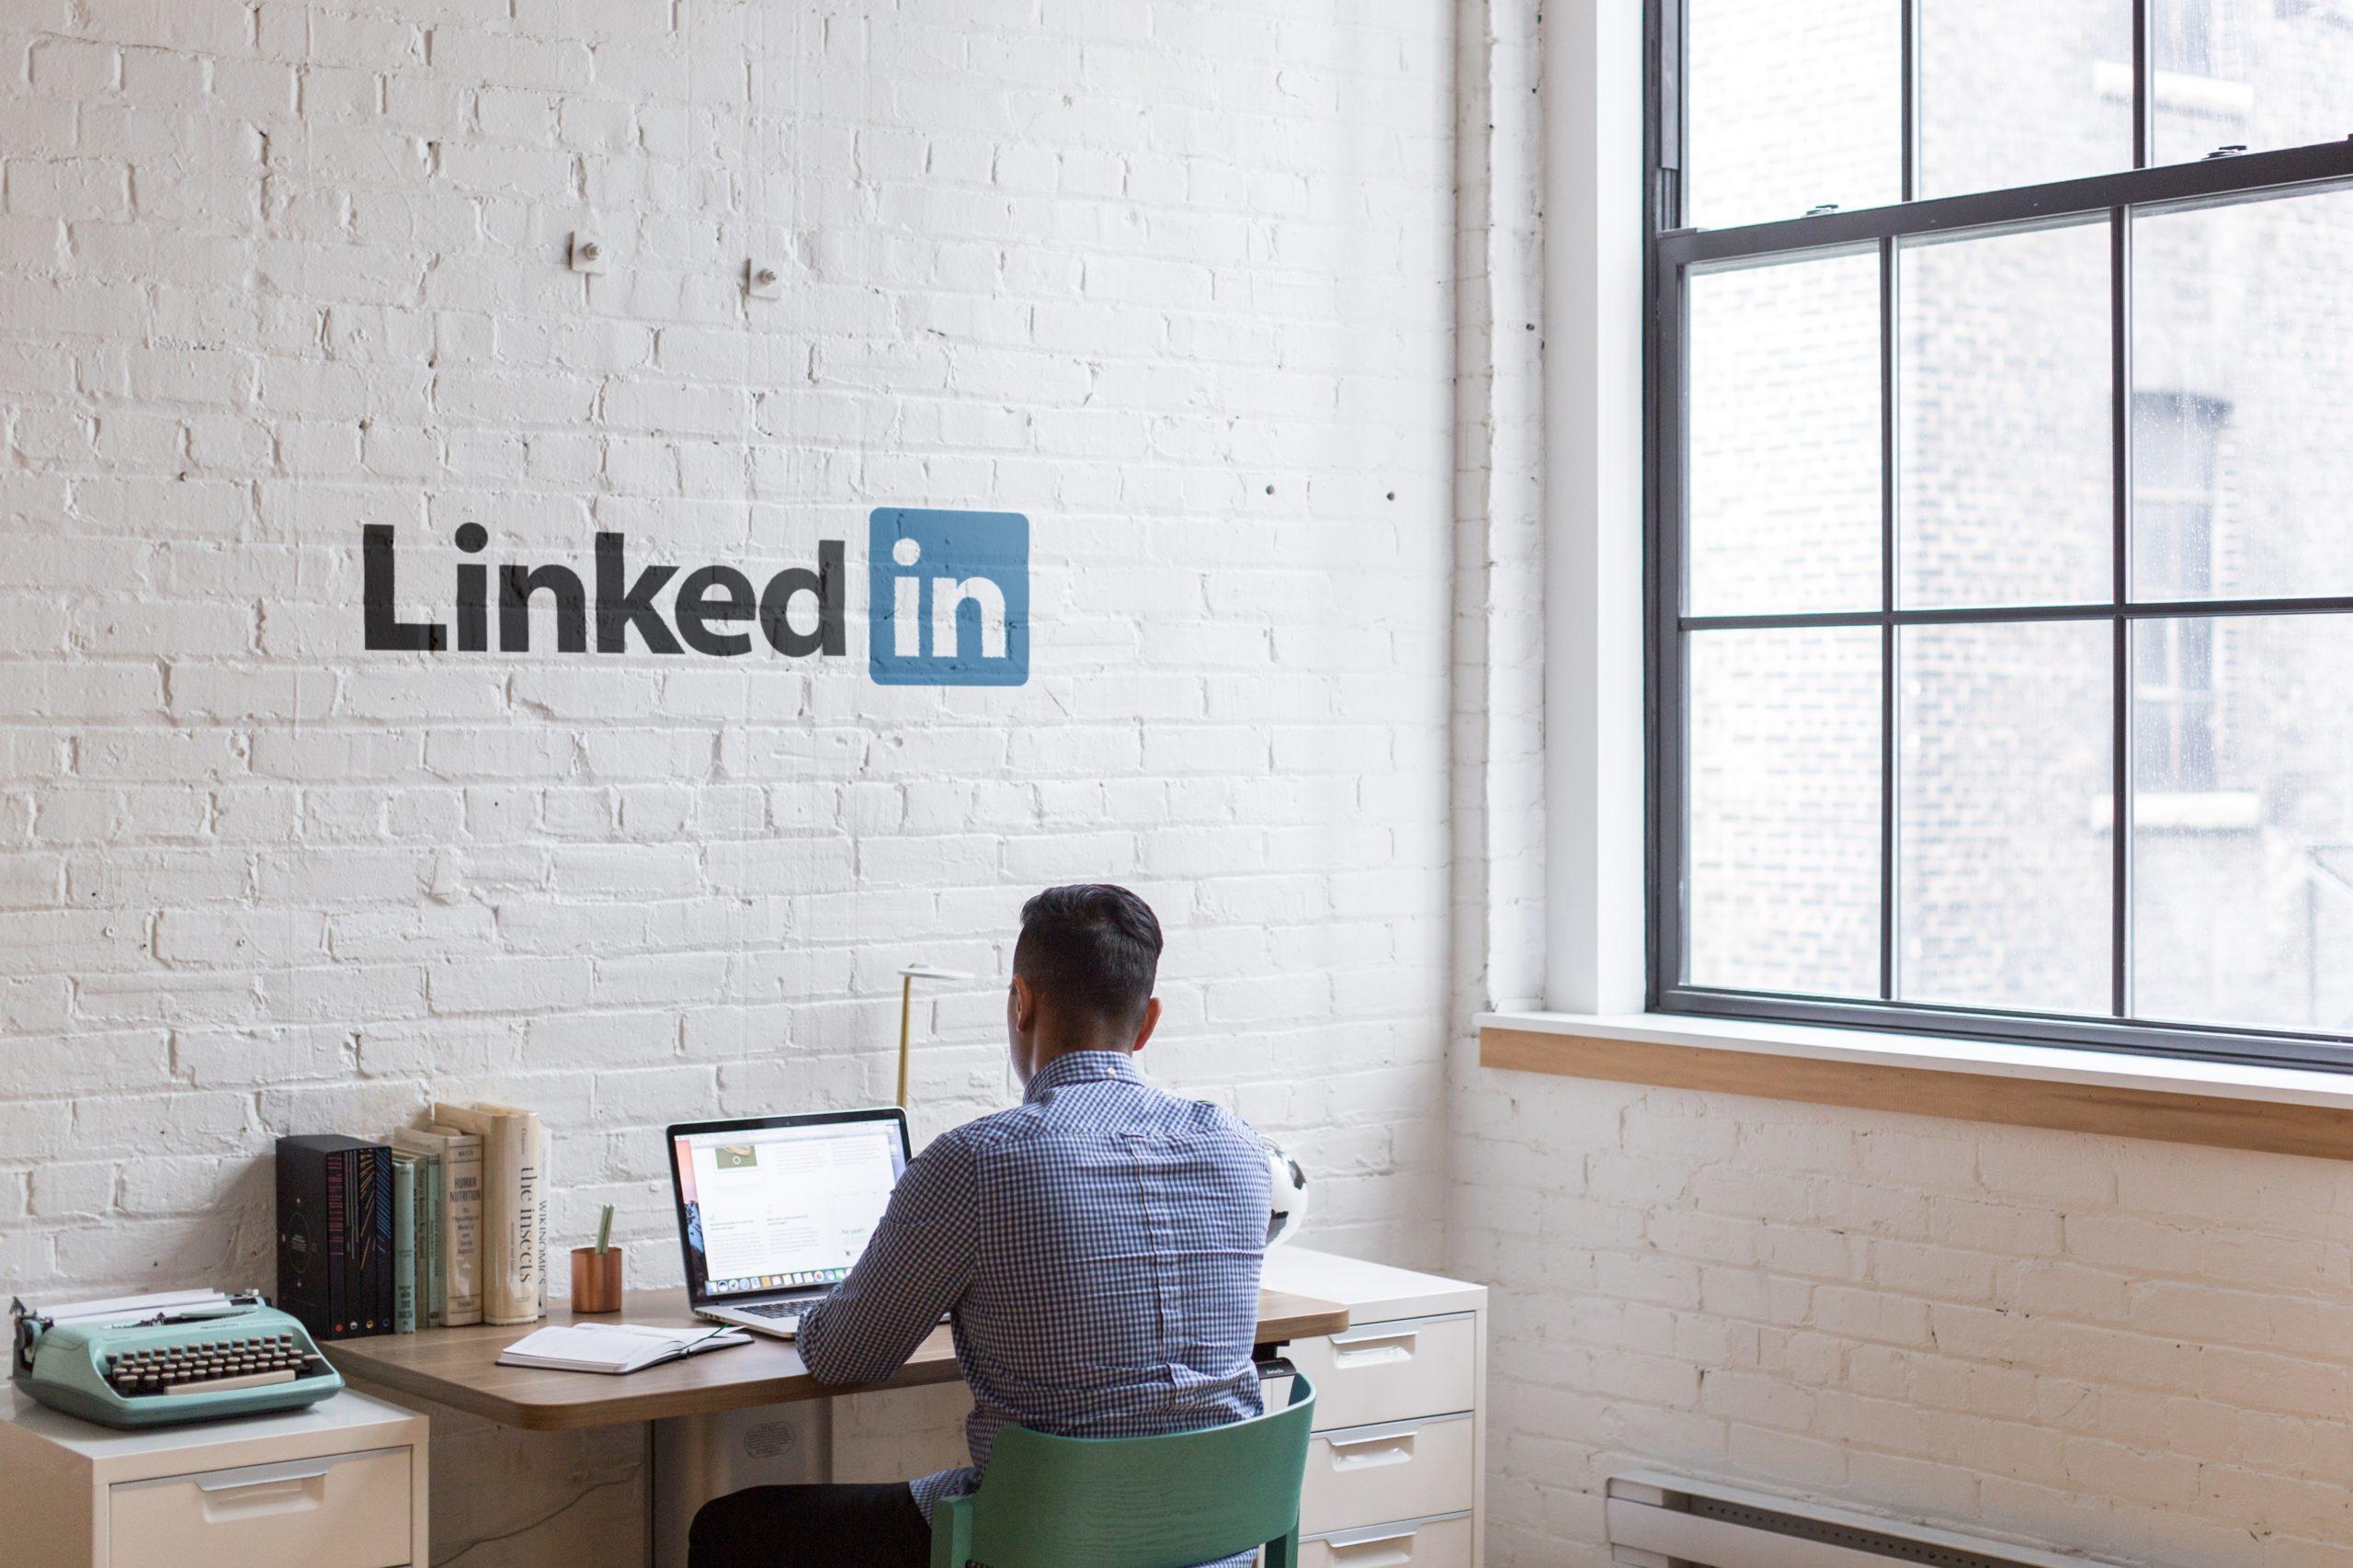 dws Blog LinkedIn